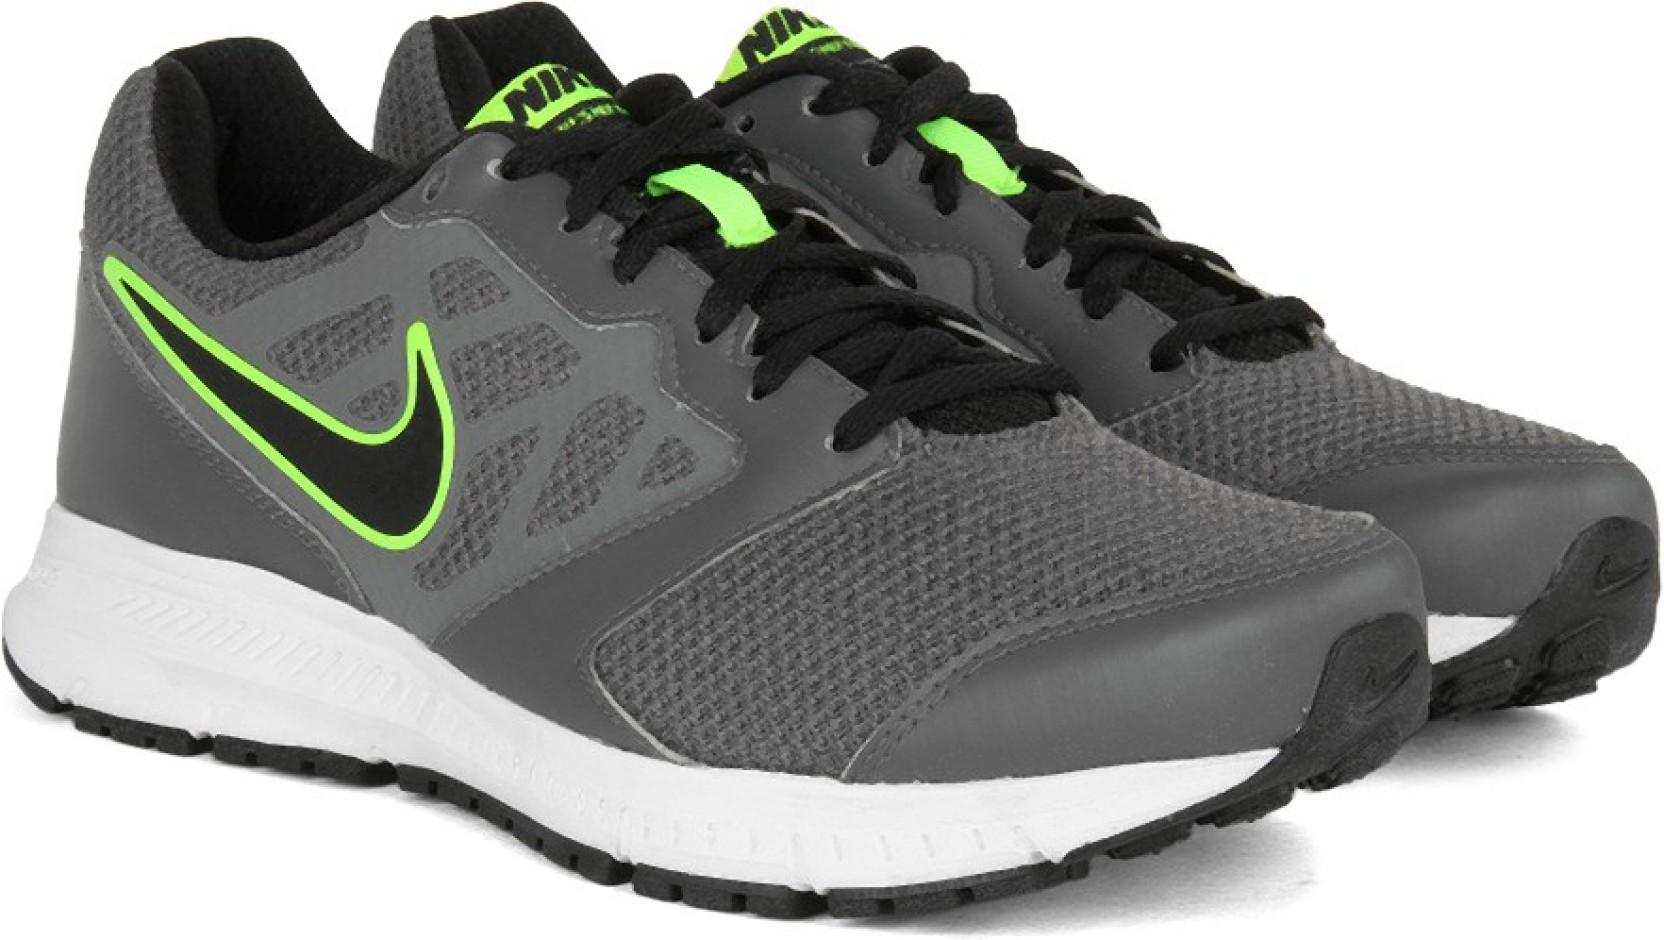 4667aba3f5c3d ... shoes for men black grey white e5fee e2ada discount nike downshifter 6  msl running shoes for men black grey white e5fee e2ada  order adidas  ultraboost ...